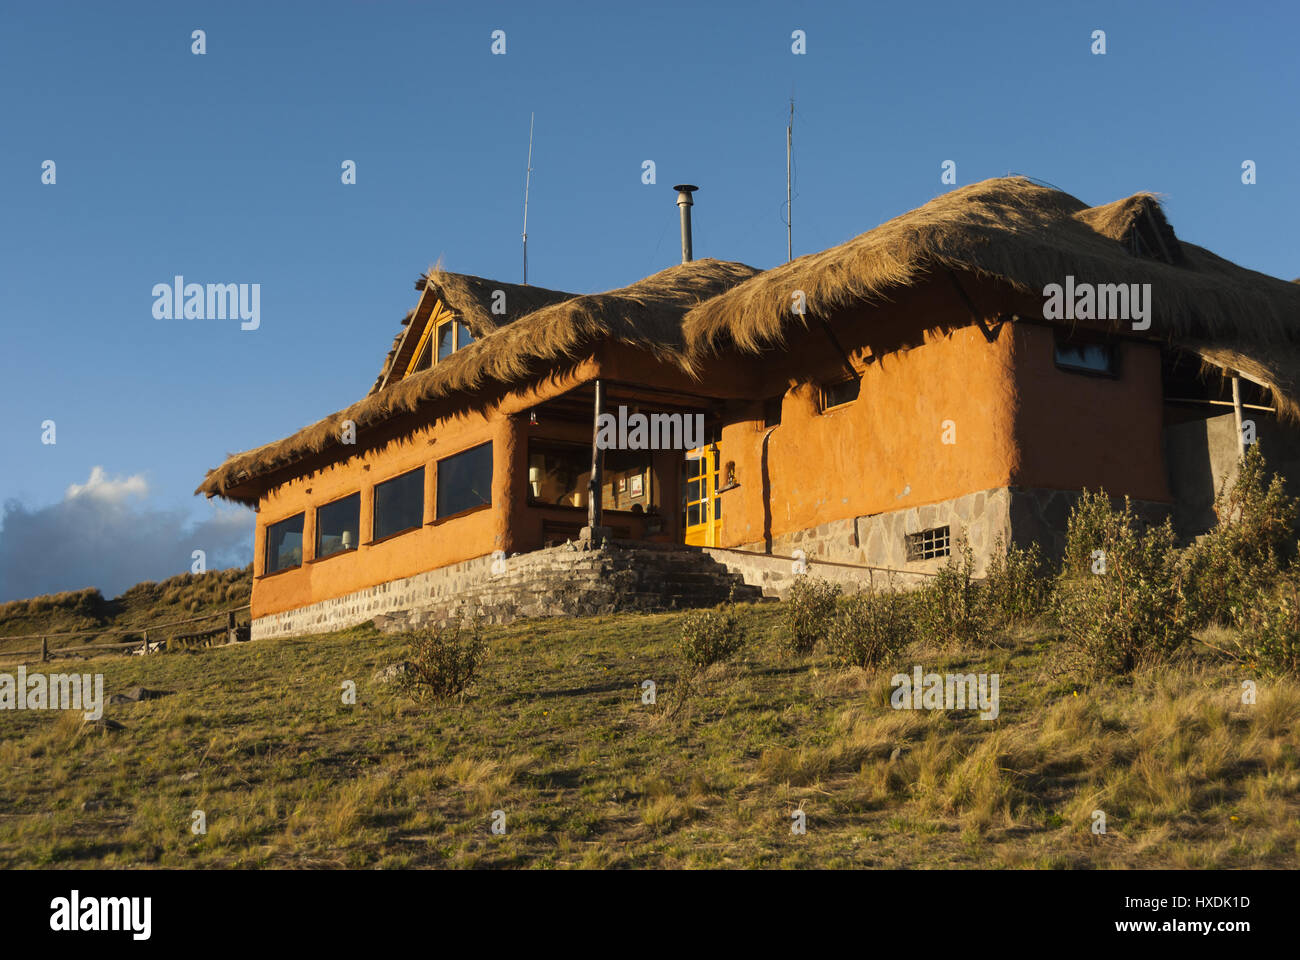 Ecuador, Cotopaxi Nationalpark, Tambopaxi Lodge Stockbild